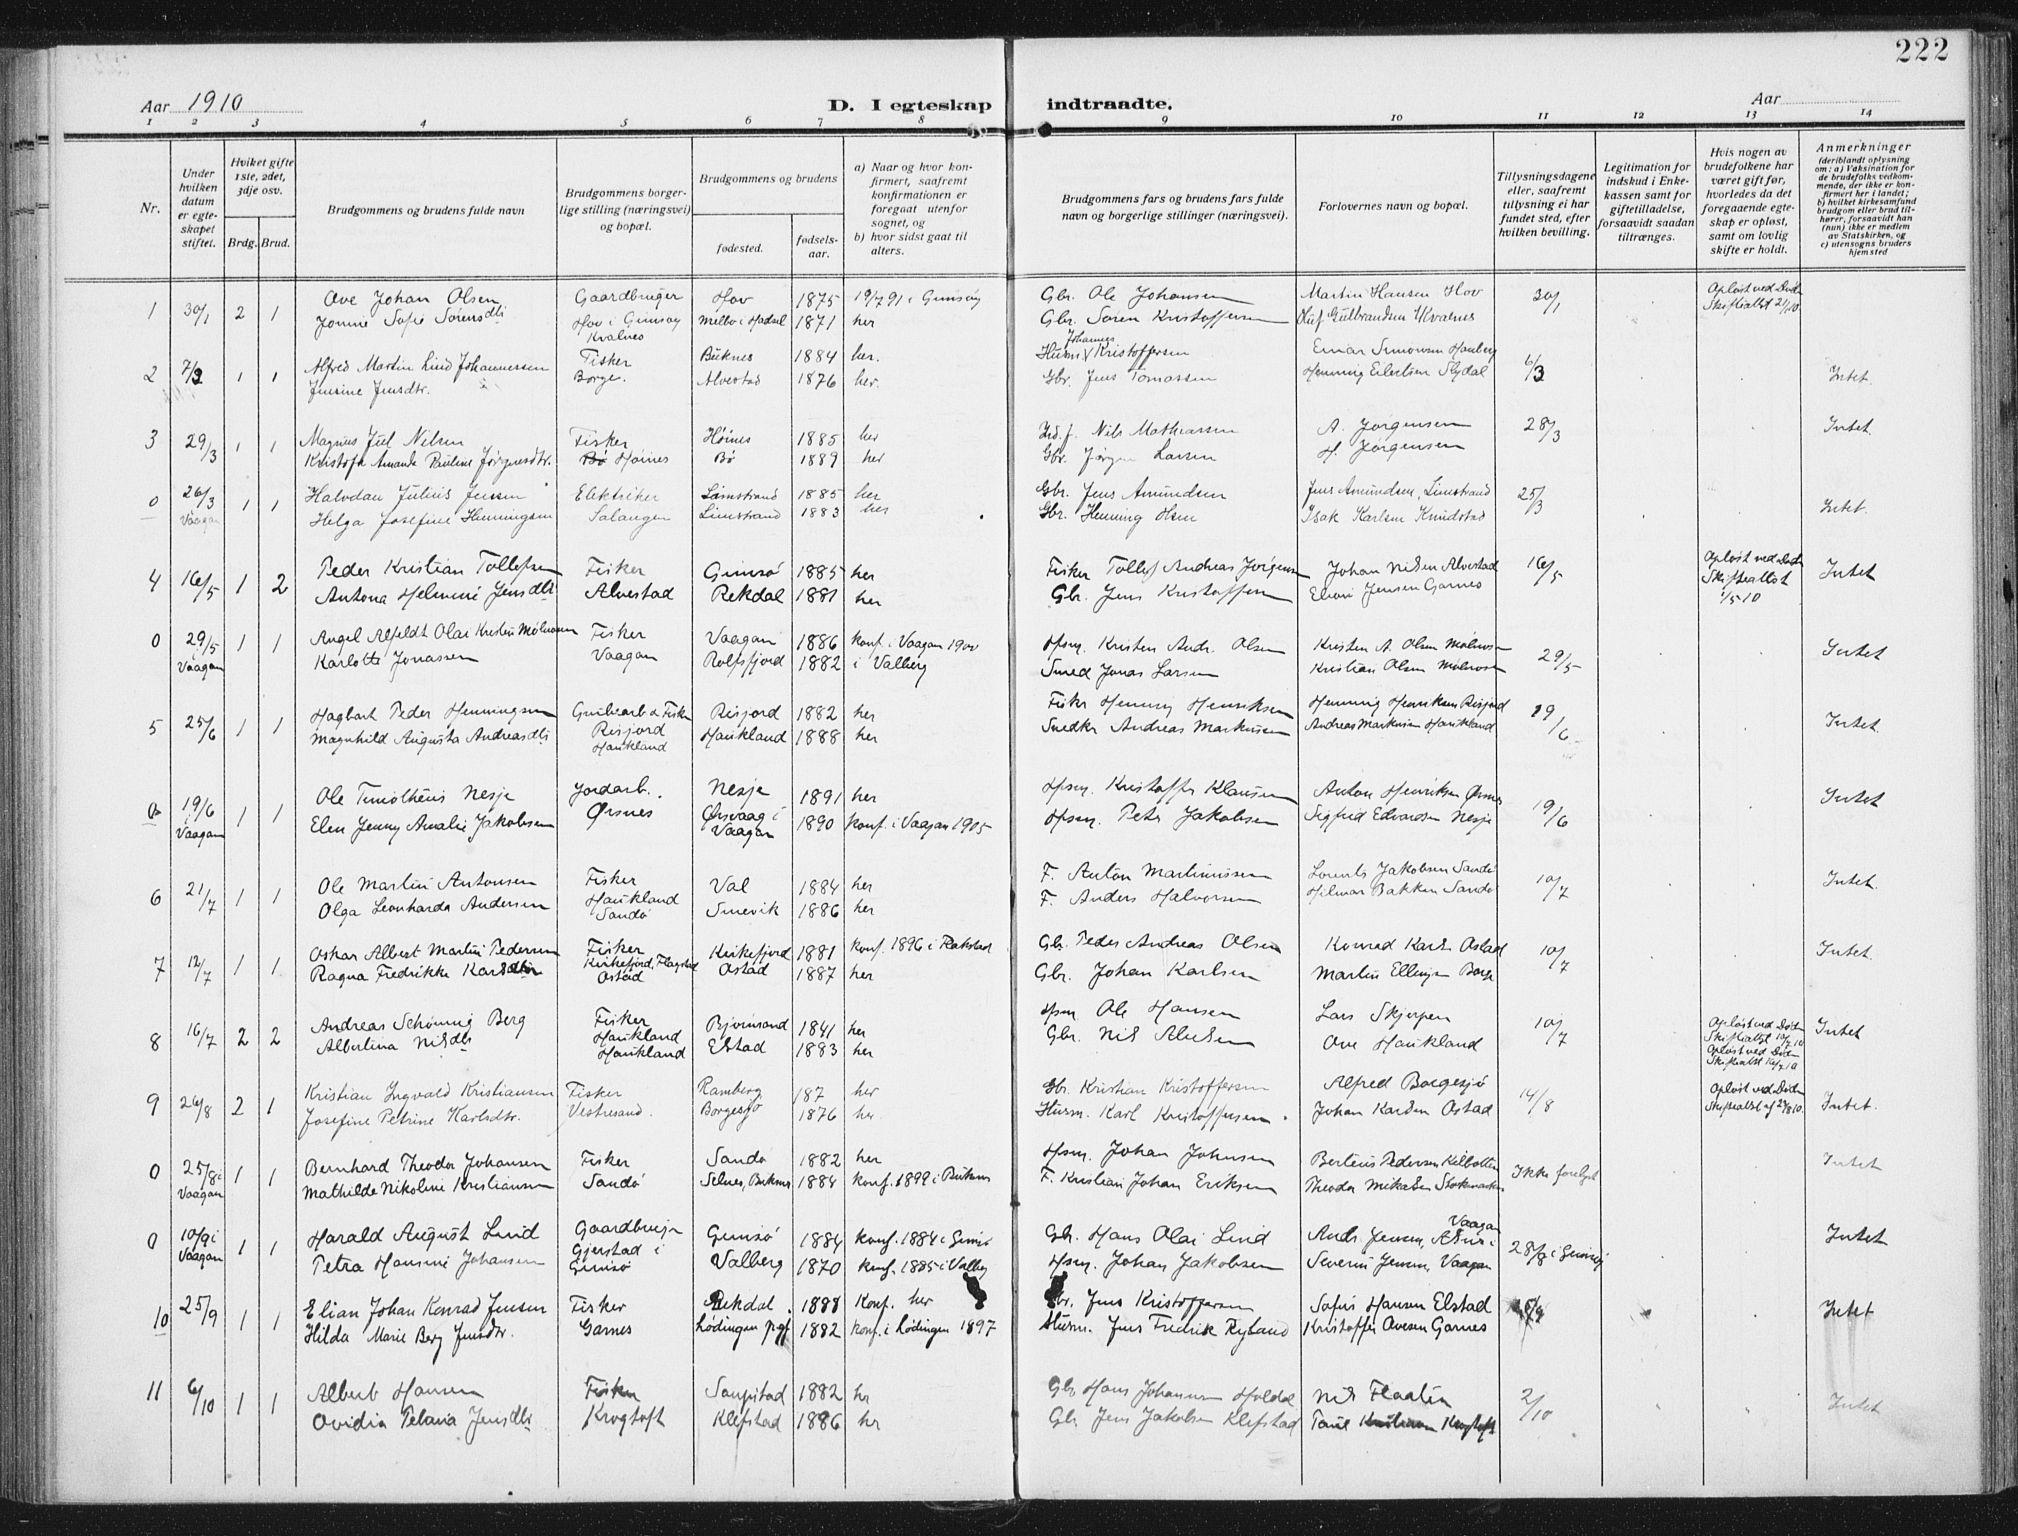 SAT, Ministerialprotokoller, klokkerbøker og fødselsregistre - Nordland, 880/L1135: Ministerialbok nr. 880A09, 1908-1919, s. 222